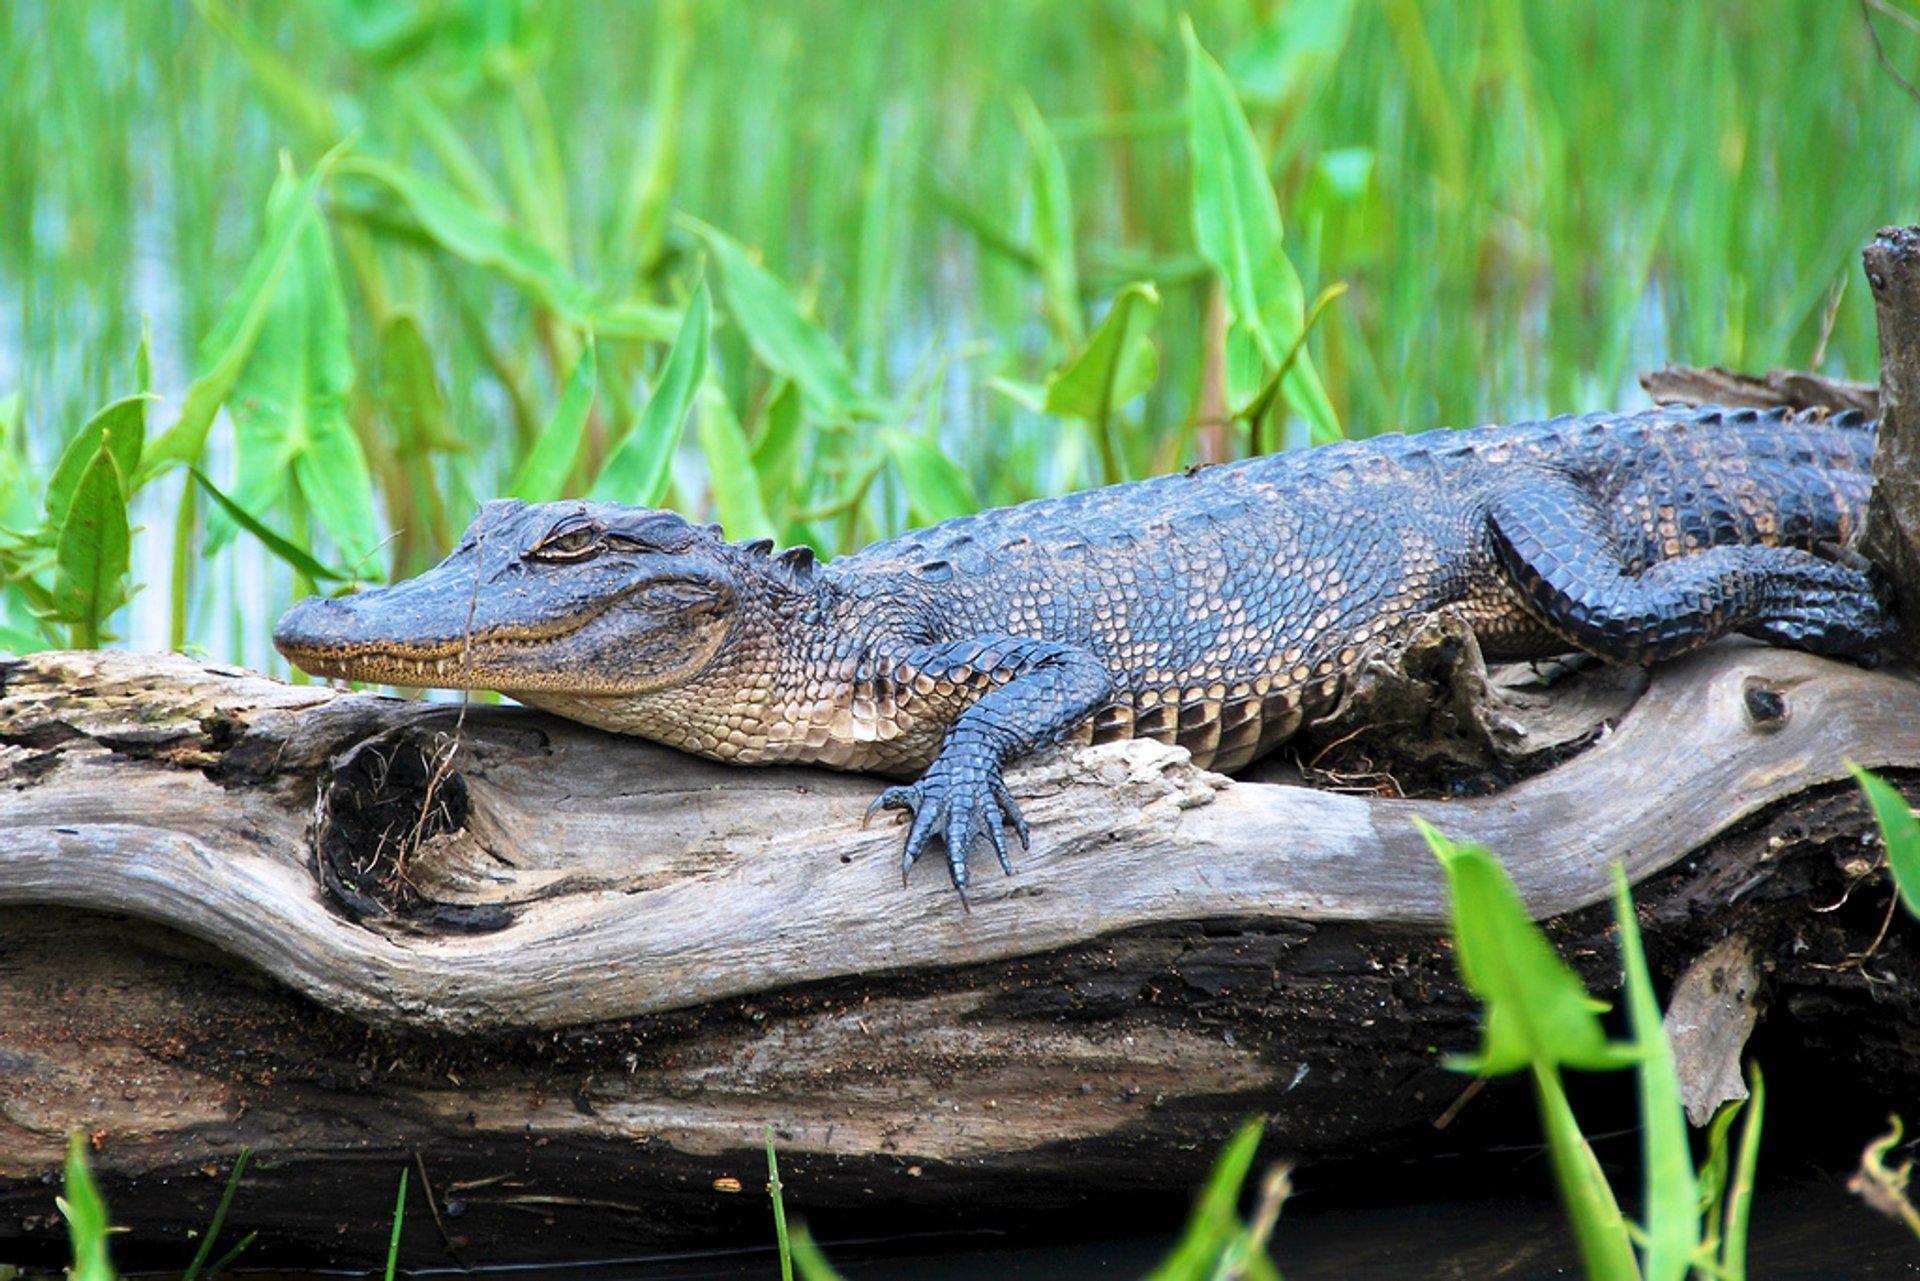 Alligator at Honey Island Swamp 2020